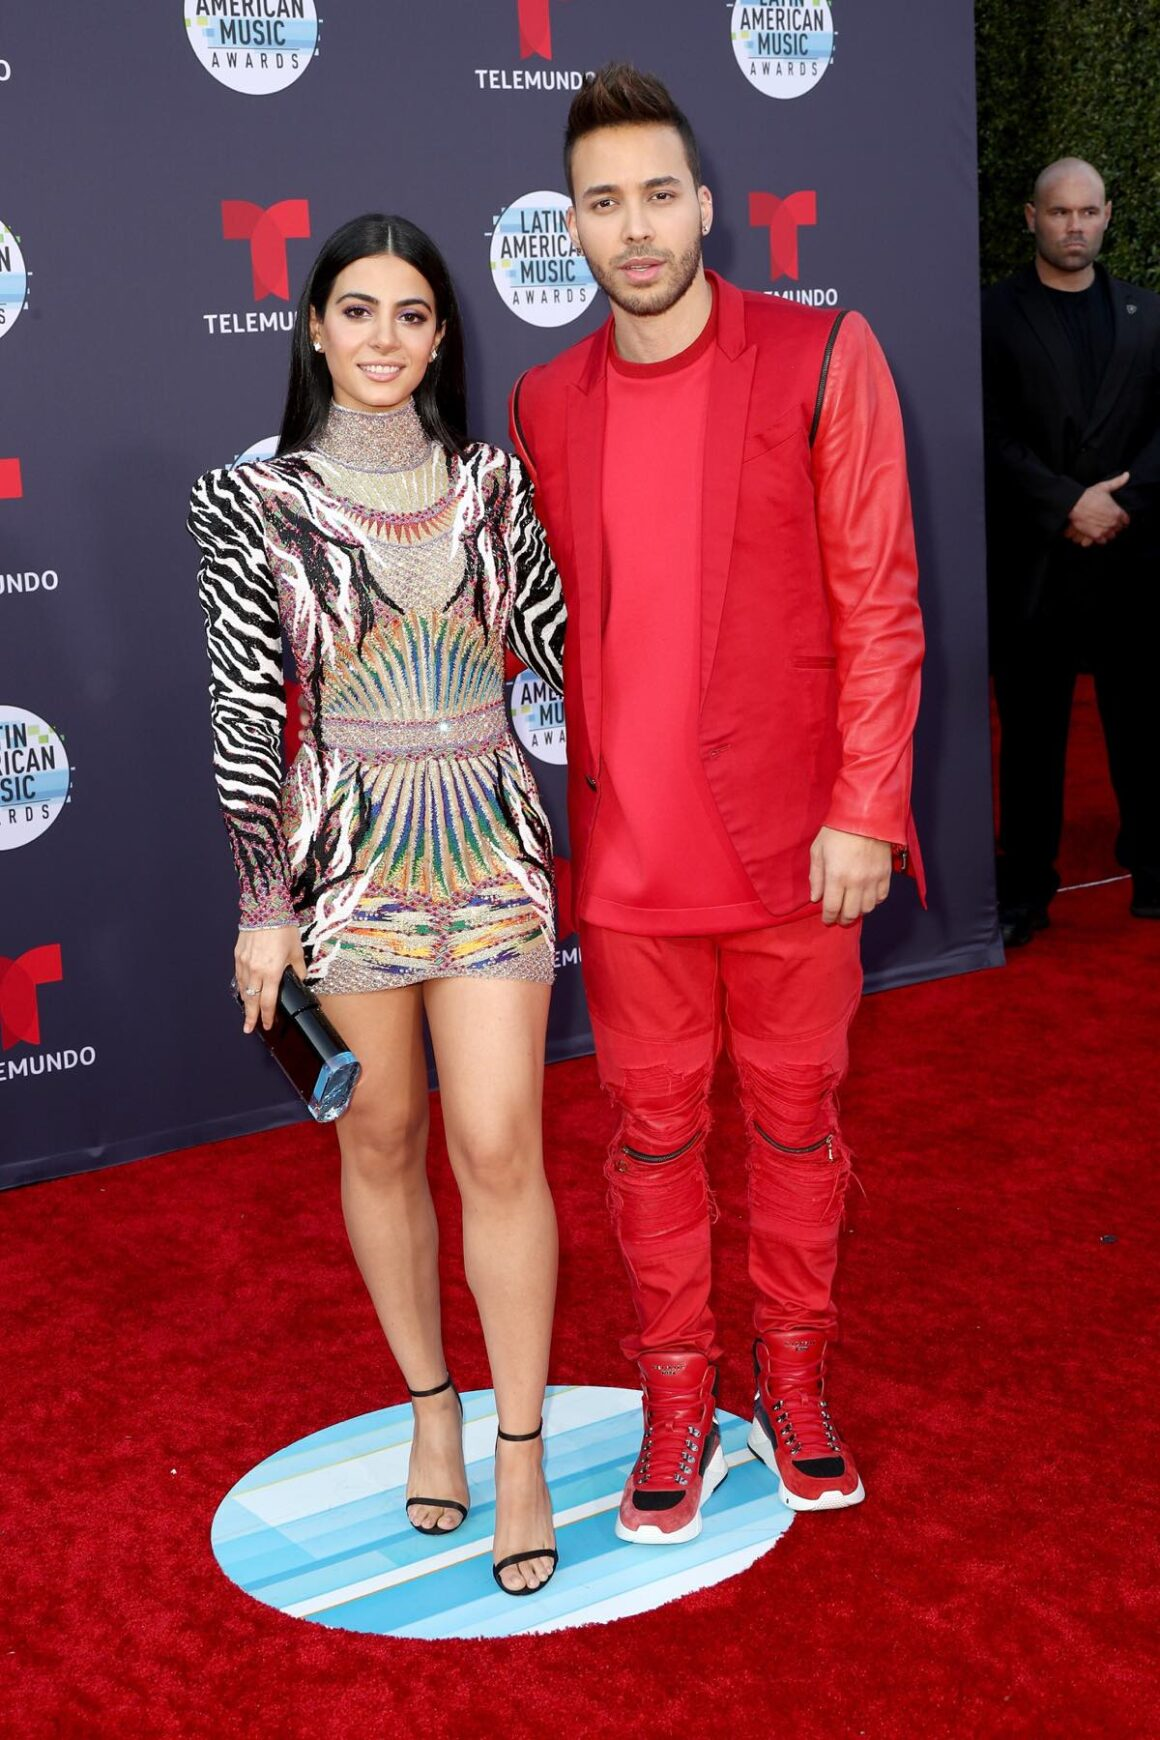 Prince Royce 2018 Latin American Music Awards - Arrivals